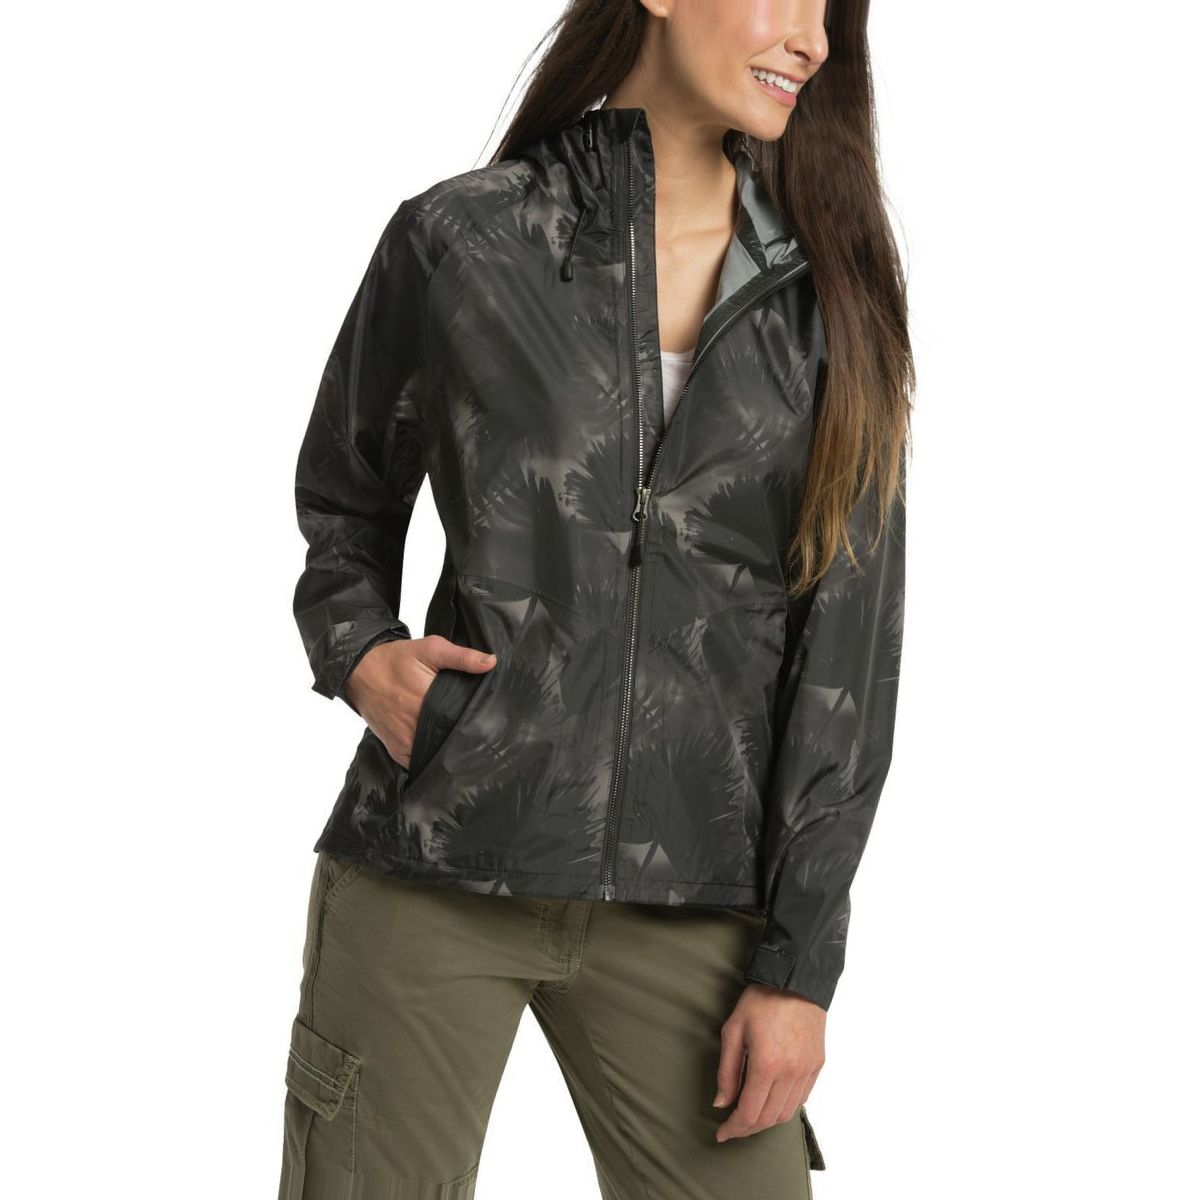 Basin and Range Spiro Rain Jacket - Women's